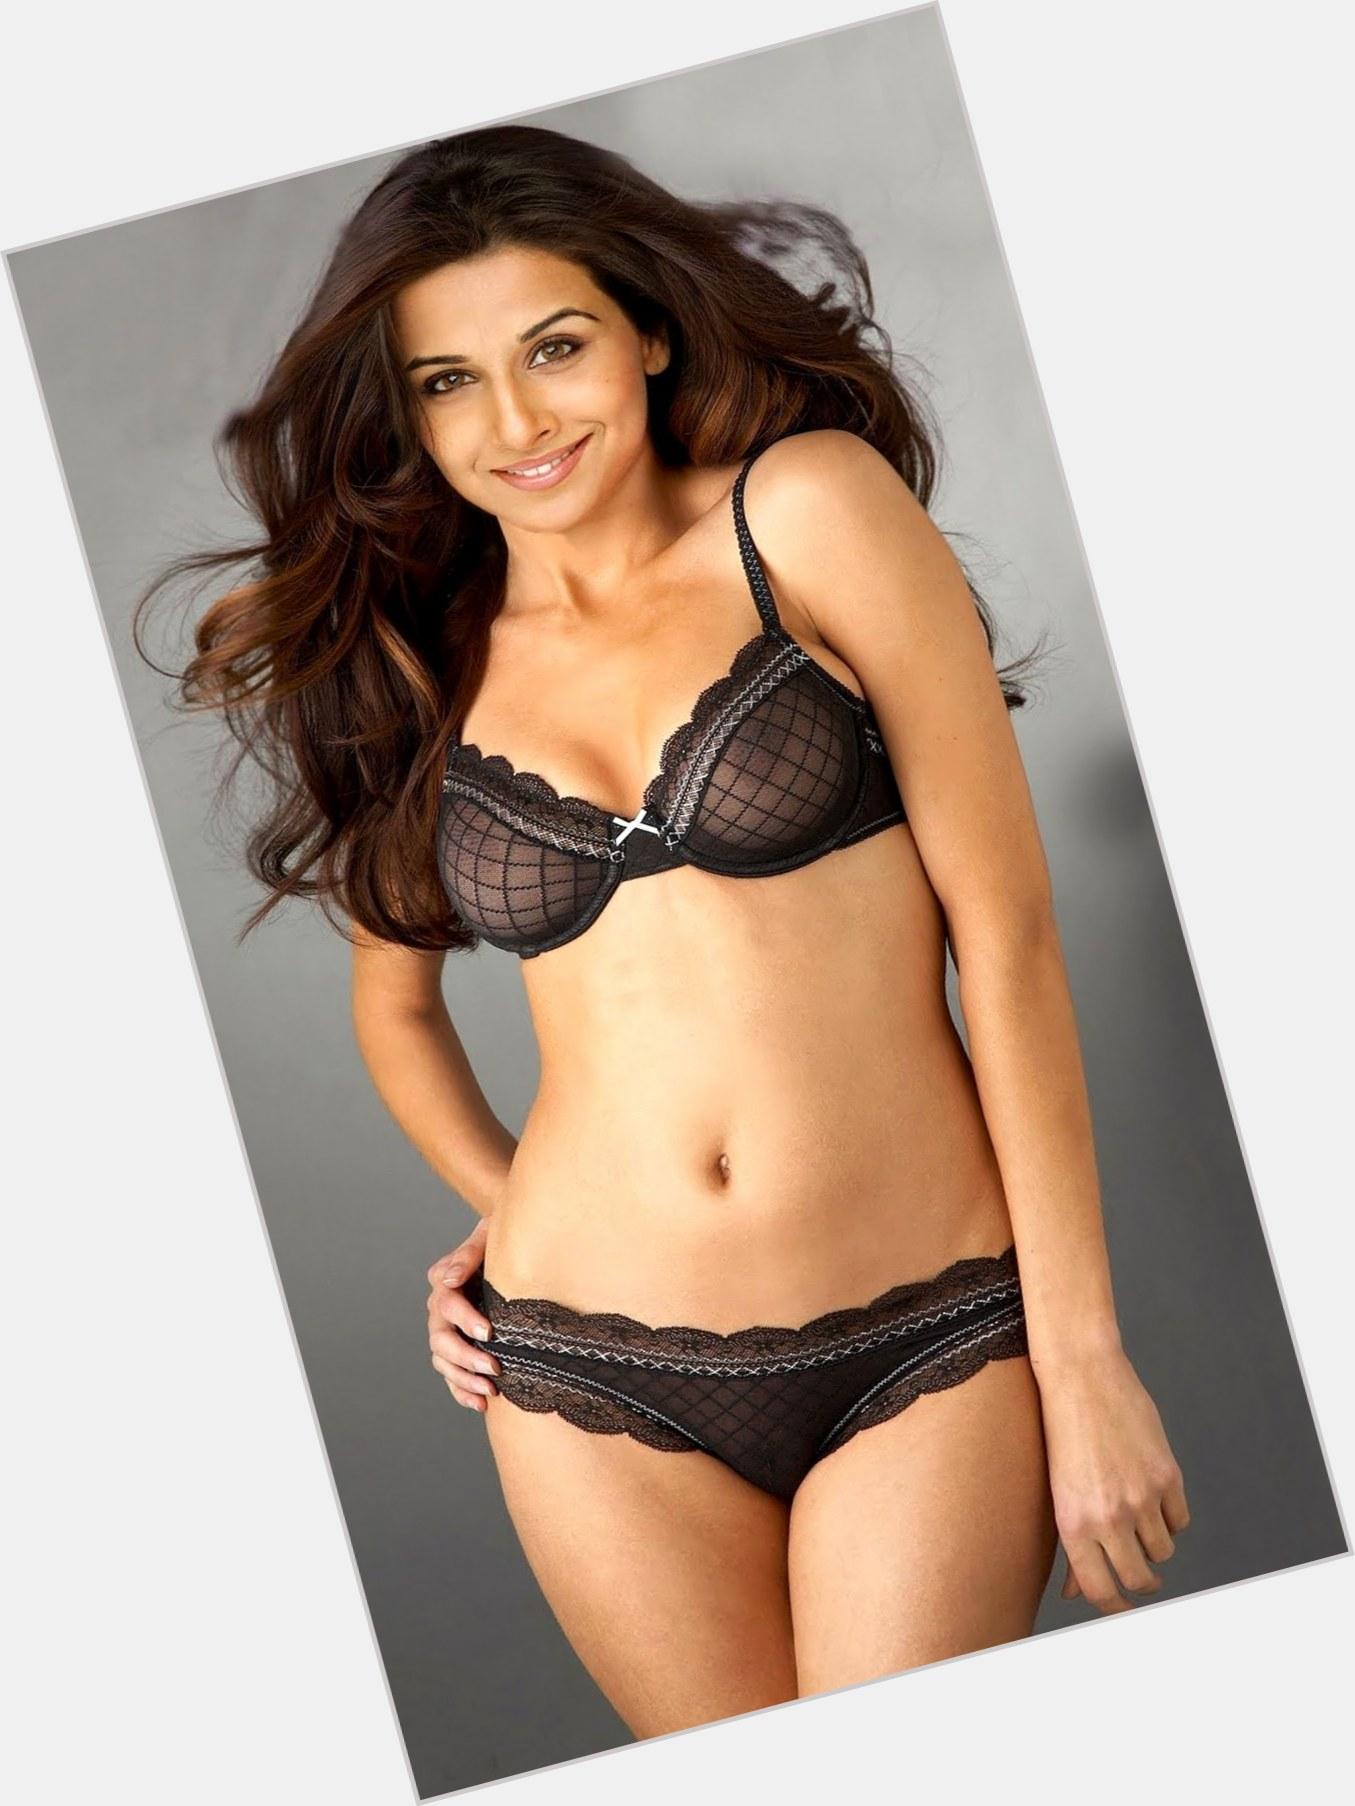 Gina Lollobrigida Body Height Weight Bra Size